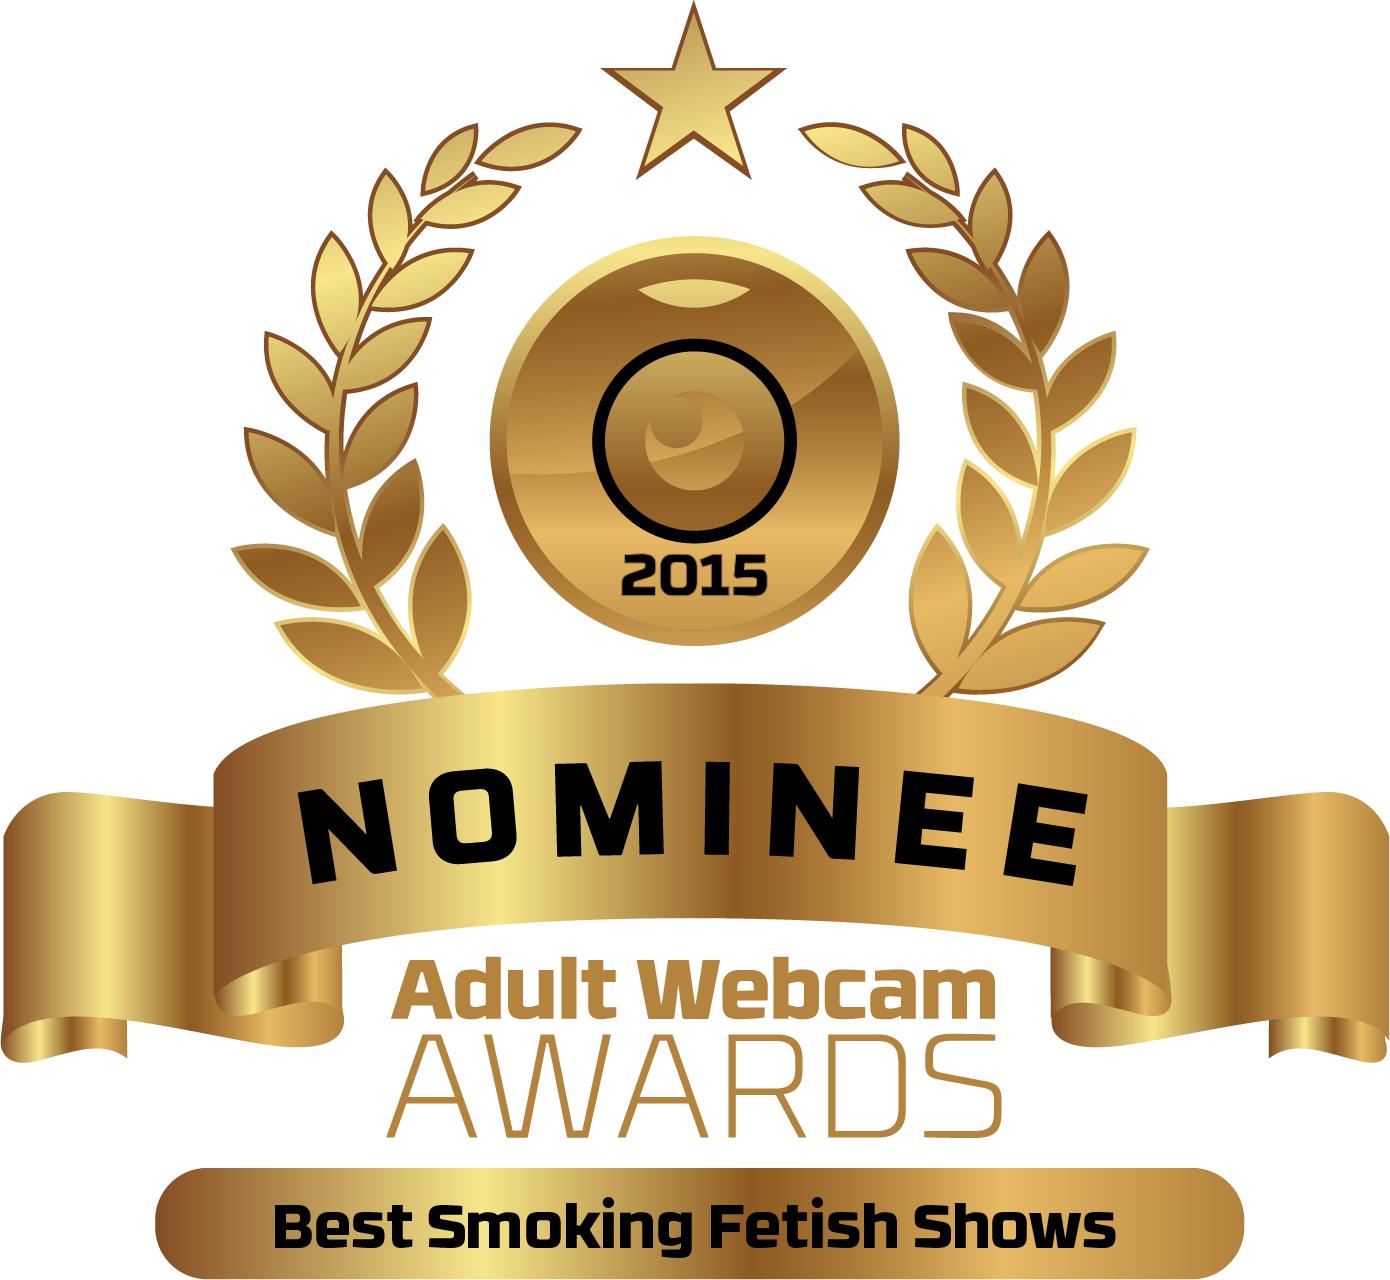 Best smoking fetish show nominee